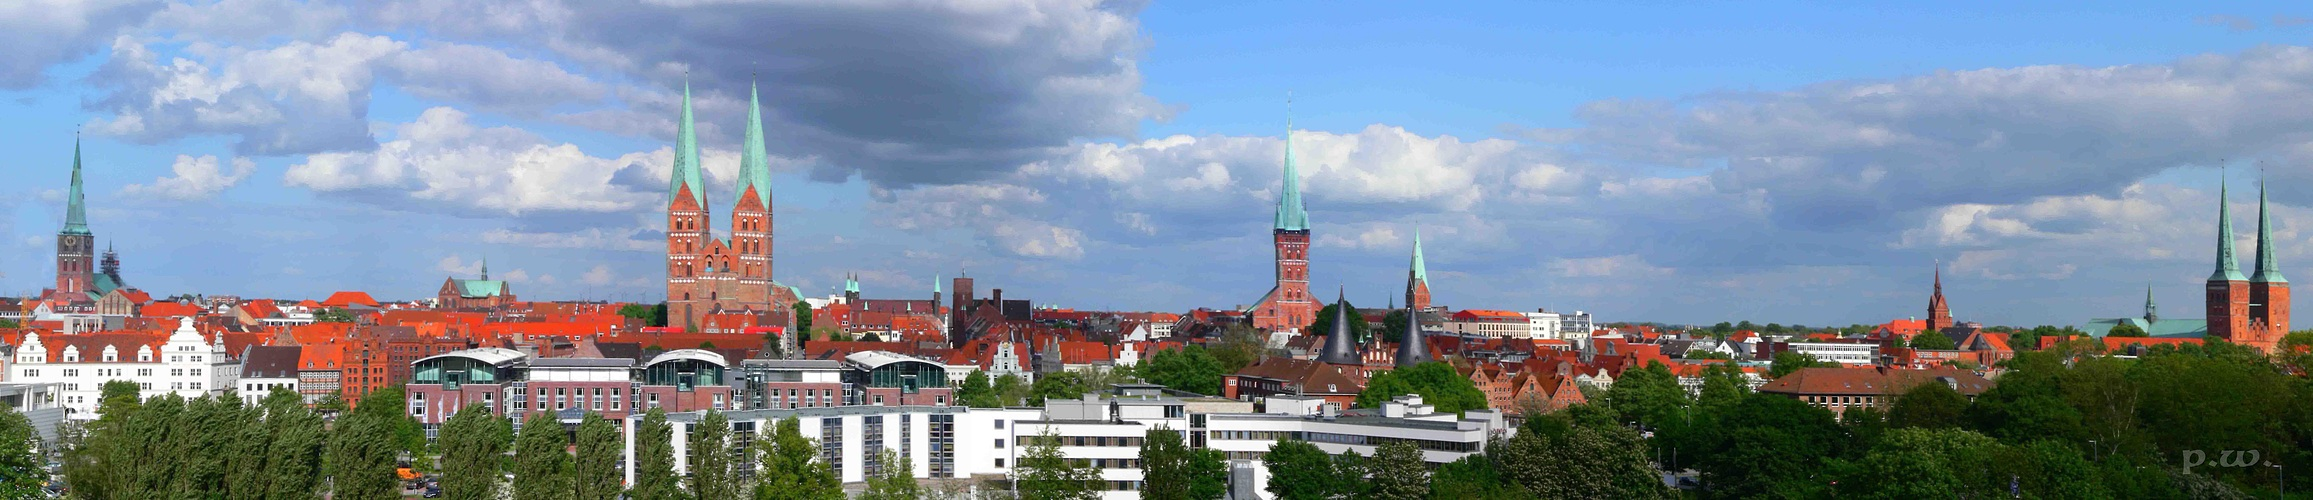 Lübeck Sieben Türme